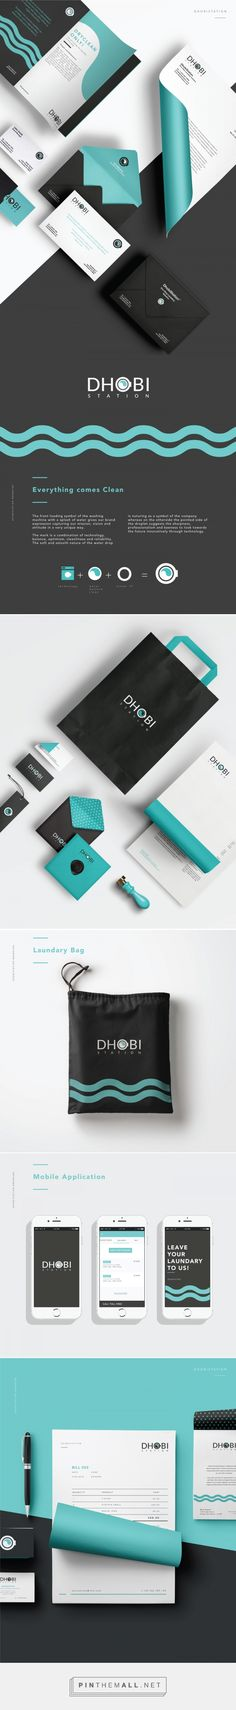 Dhobistation One Stop Laundry Solution Branding by Meroo Seth   Fivestar Branding – Design and Branding Agency & Inspiration Gallery